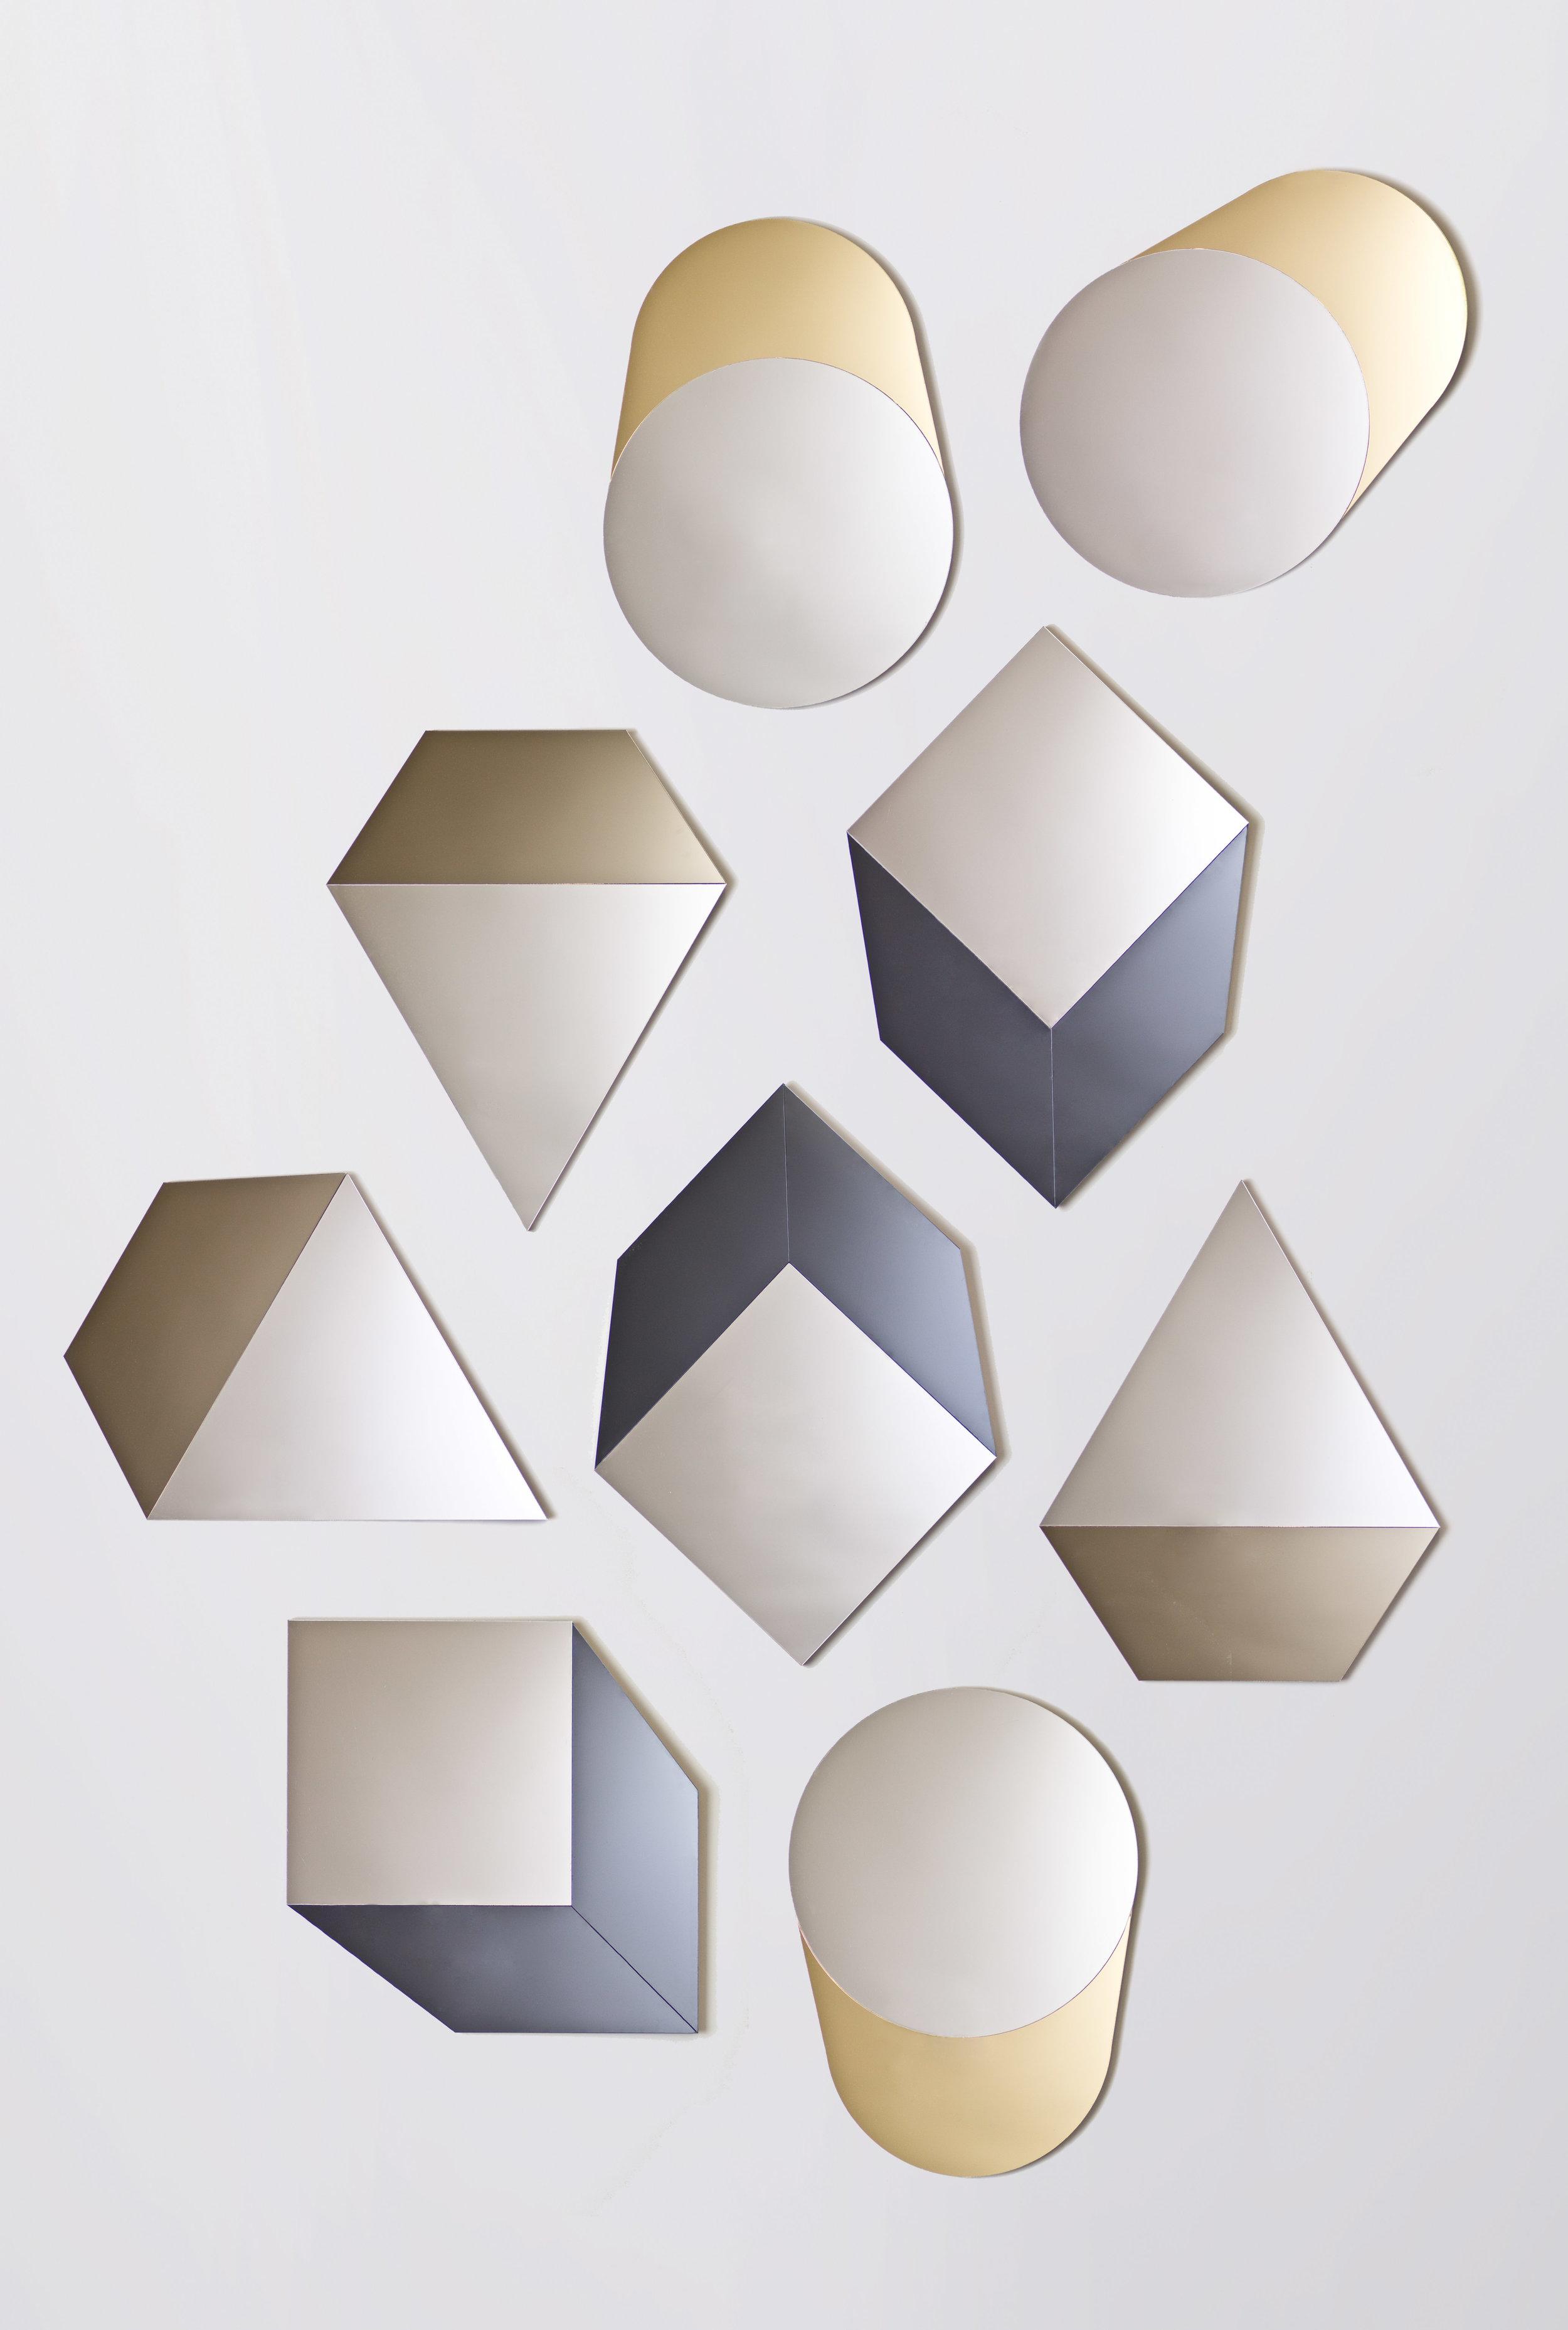 Mirror_Geometric_Silver_Gold_Bronze_Grey_Haidee_Drew.jpg